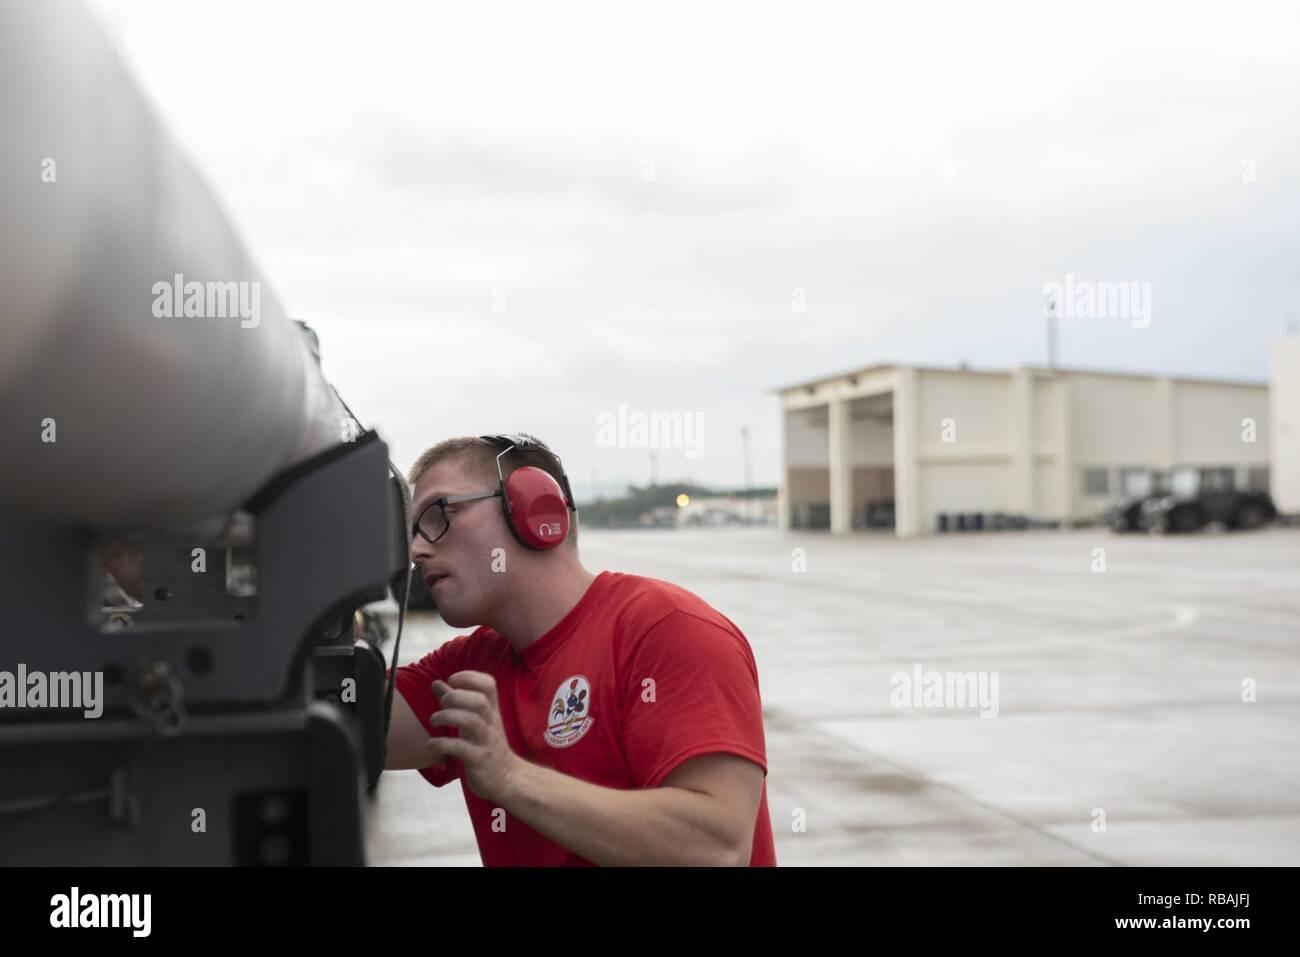 énorme réduction 27a0c 687b2 U.S. Air Force Staff Sgt. Marcus Brun, 67th Fighter Squadron ...